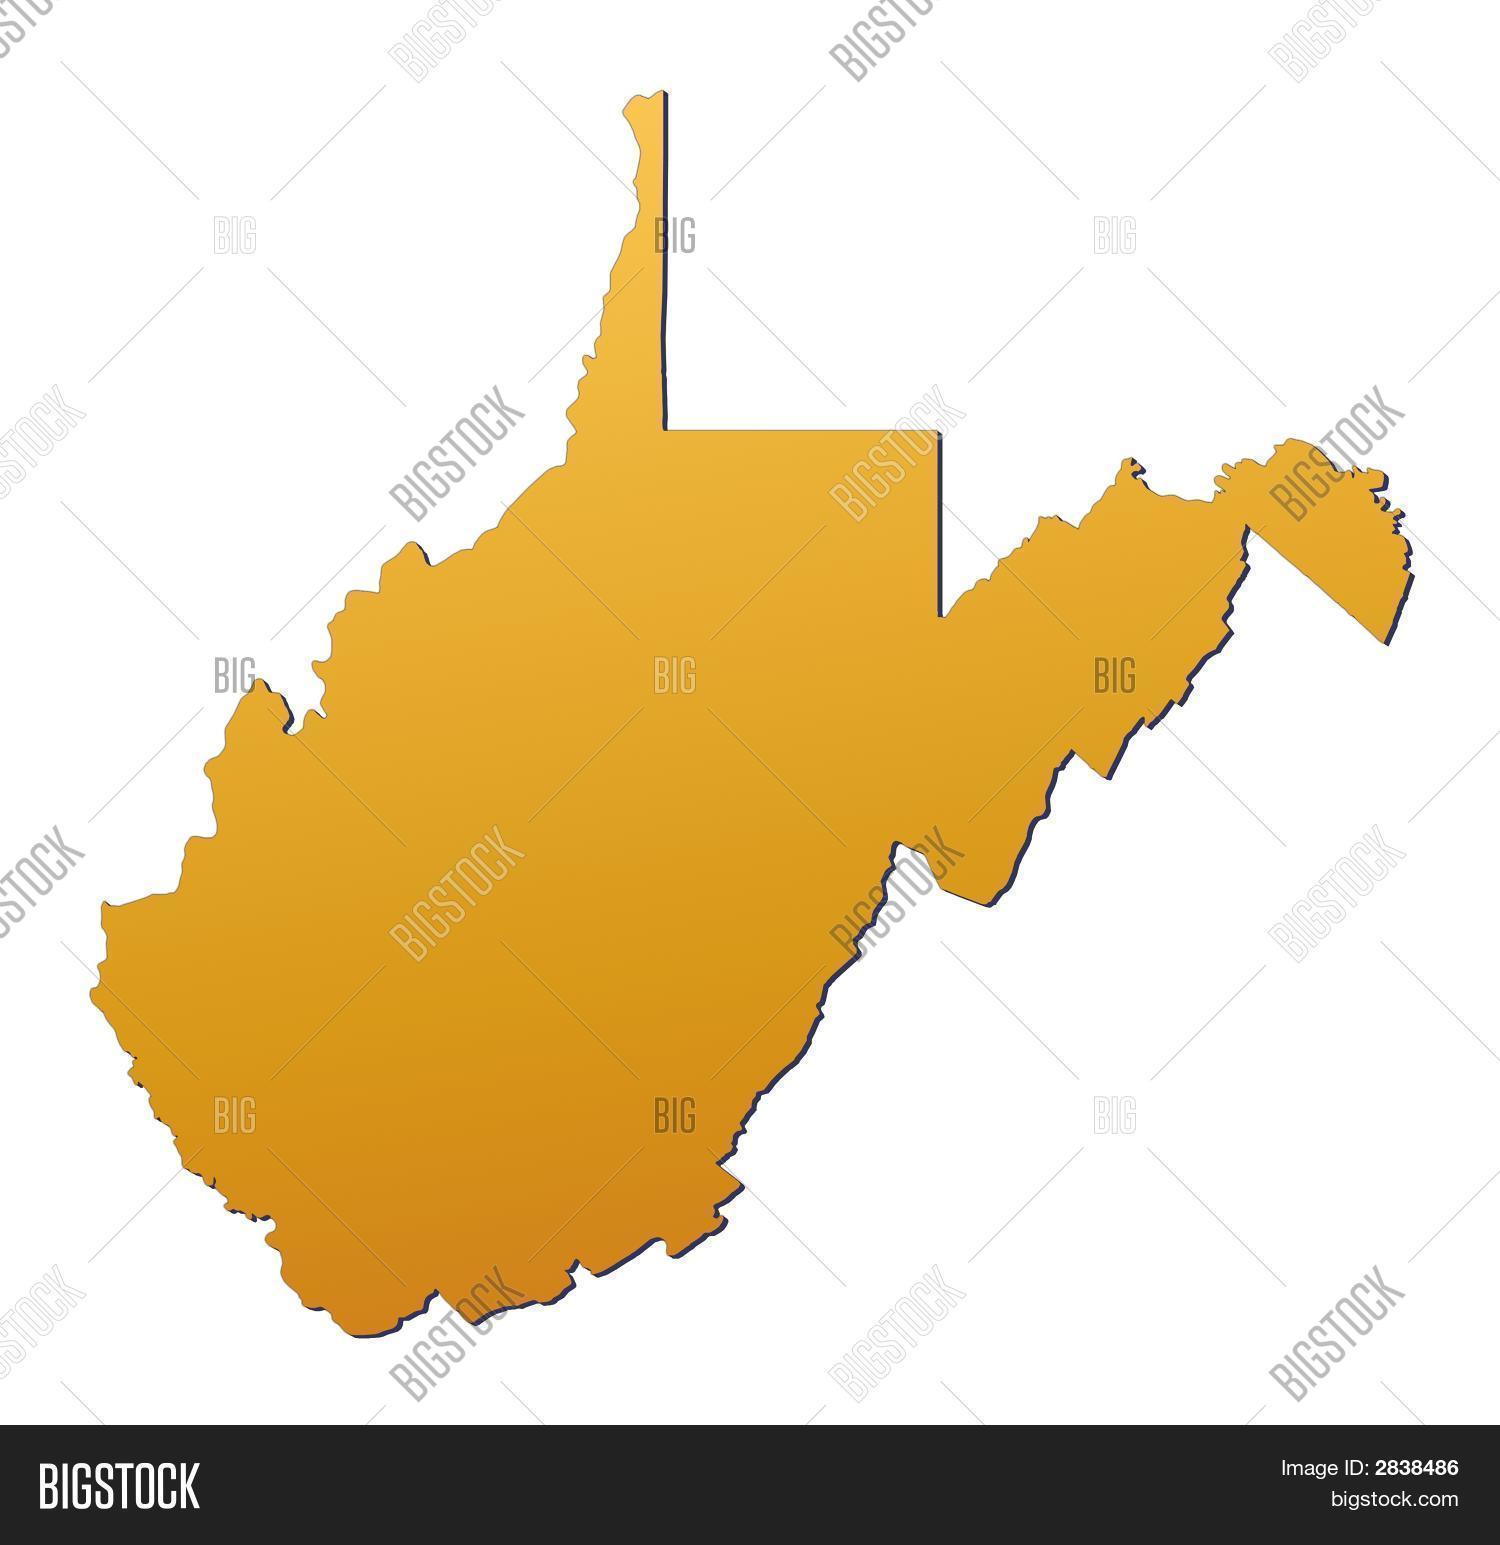 West Virginia (Usa) Image & Photo (Free Trial) | Bigstock